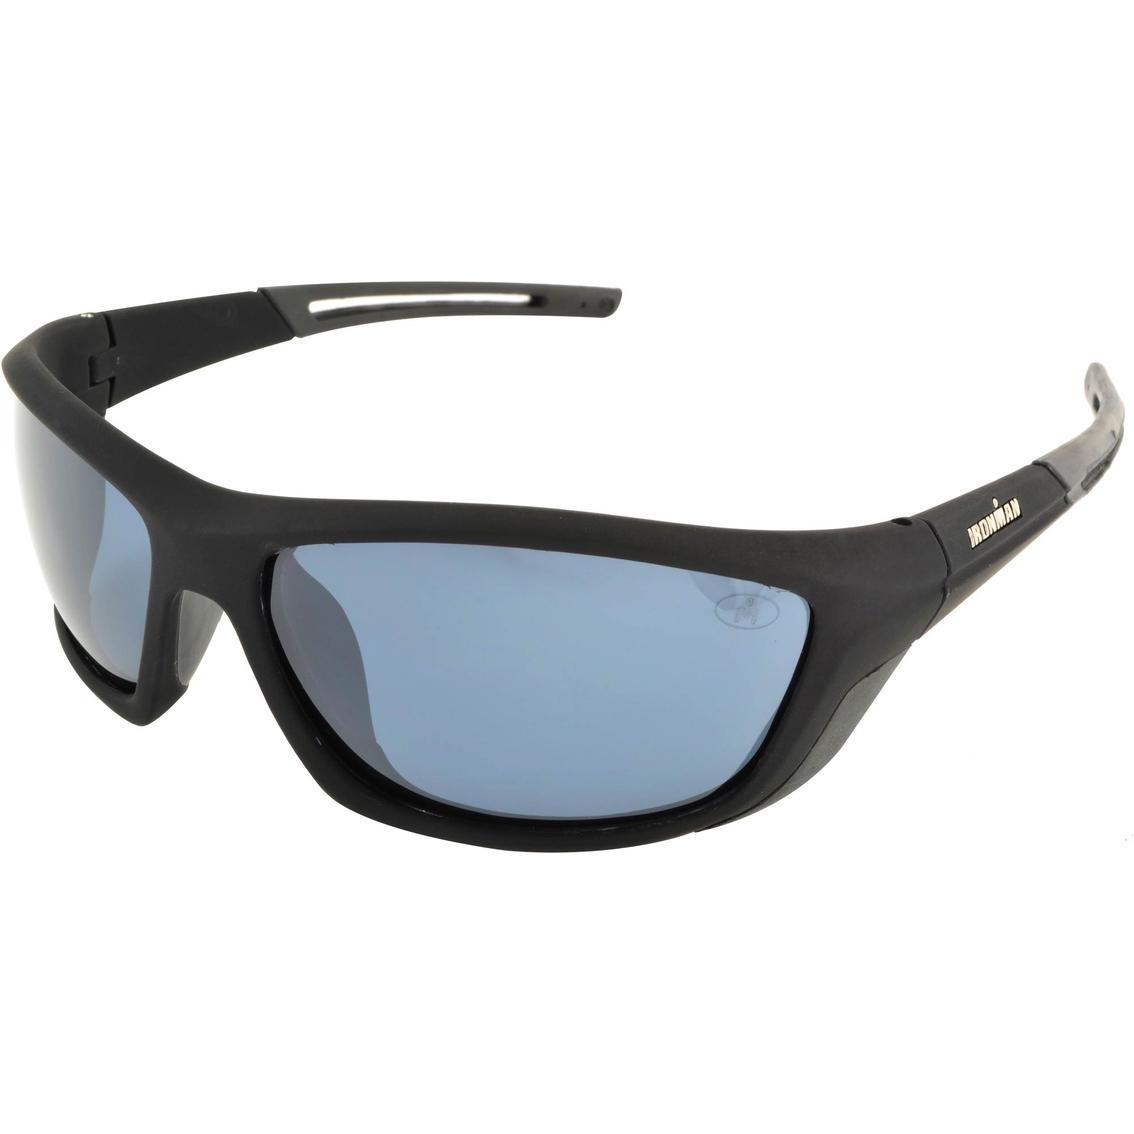 Foster Grant Sunglasses Prices  foster grant ironman zeal sunglasses men s sunglasses apparel